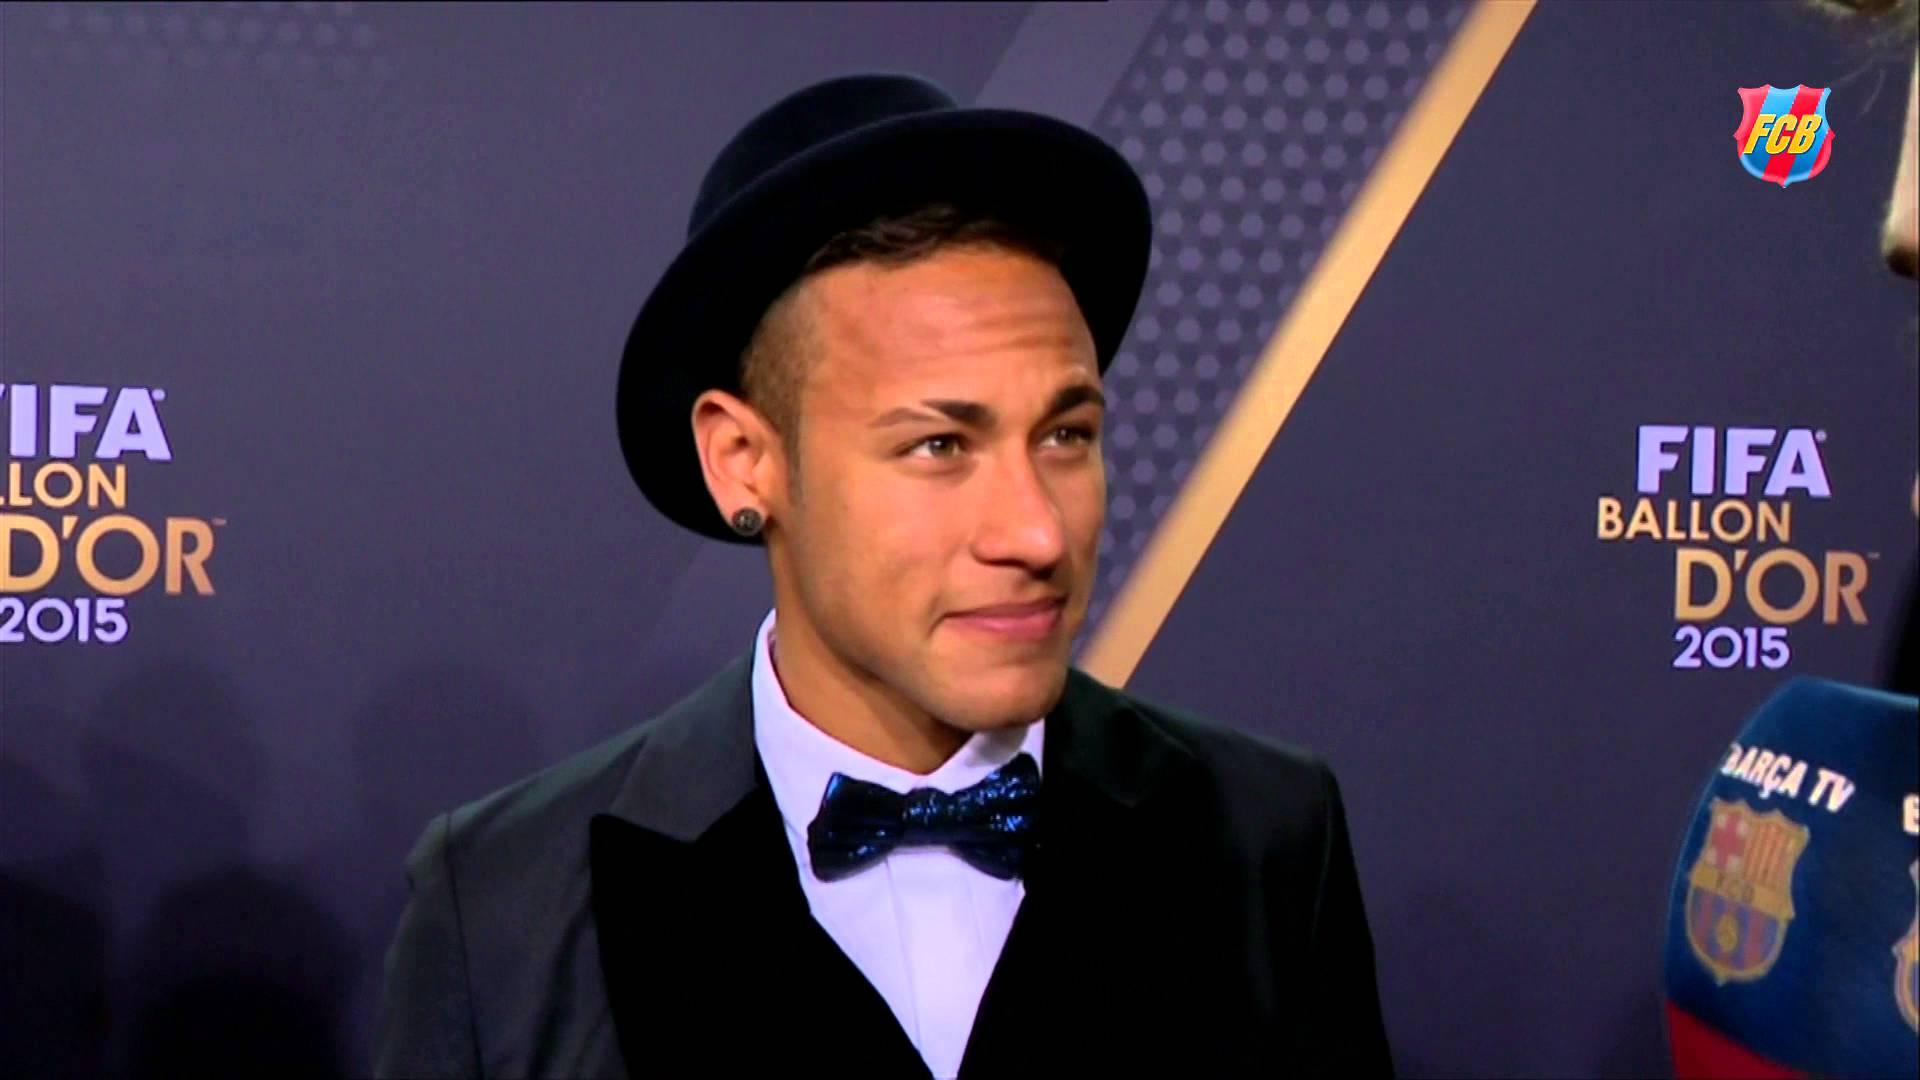 Neymar Jr. Hopes Cristiano Ronaldo Isn't Nominated For Next Ballon d'Or